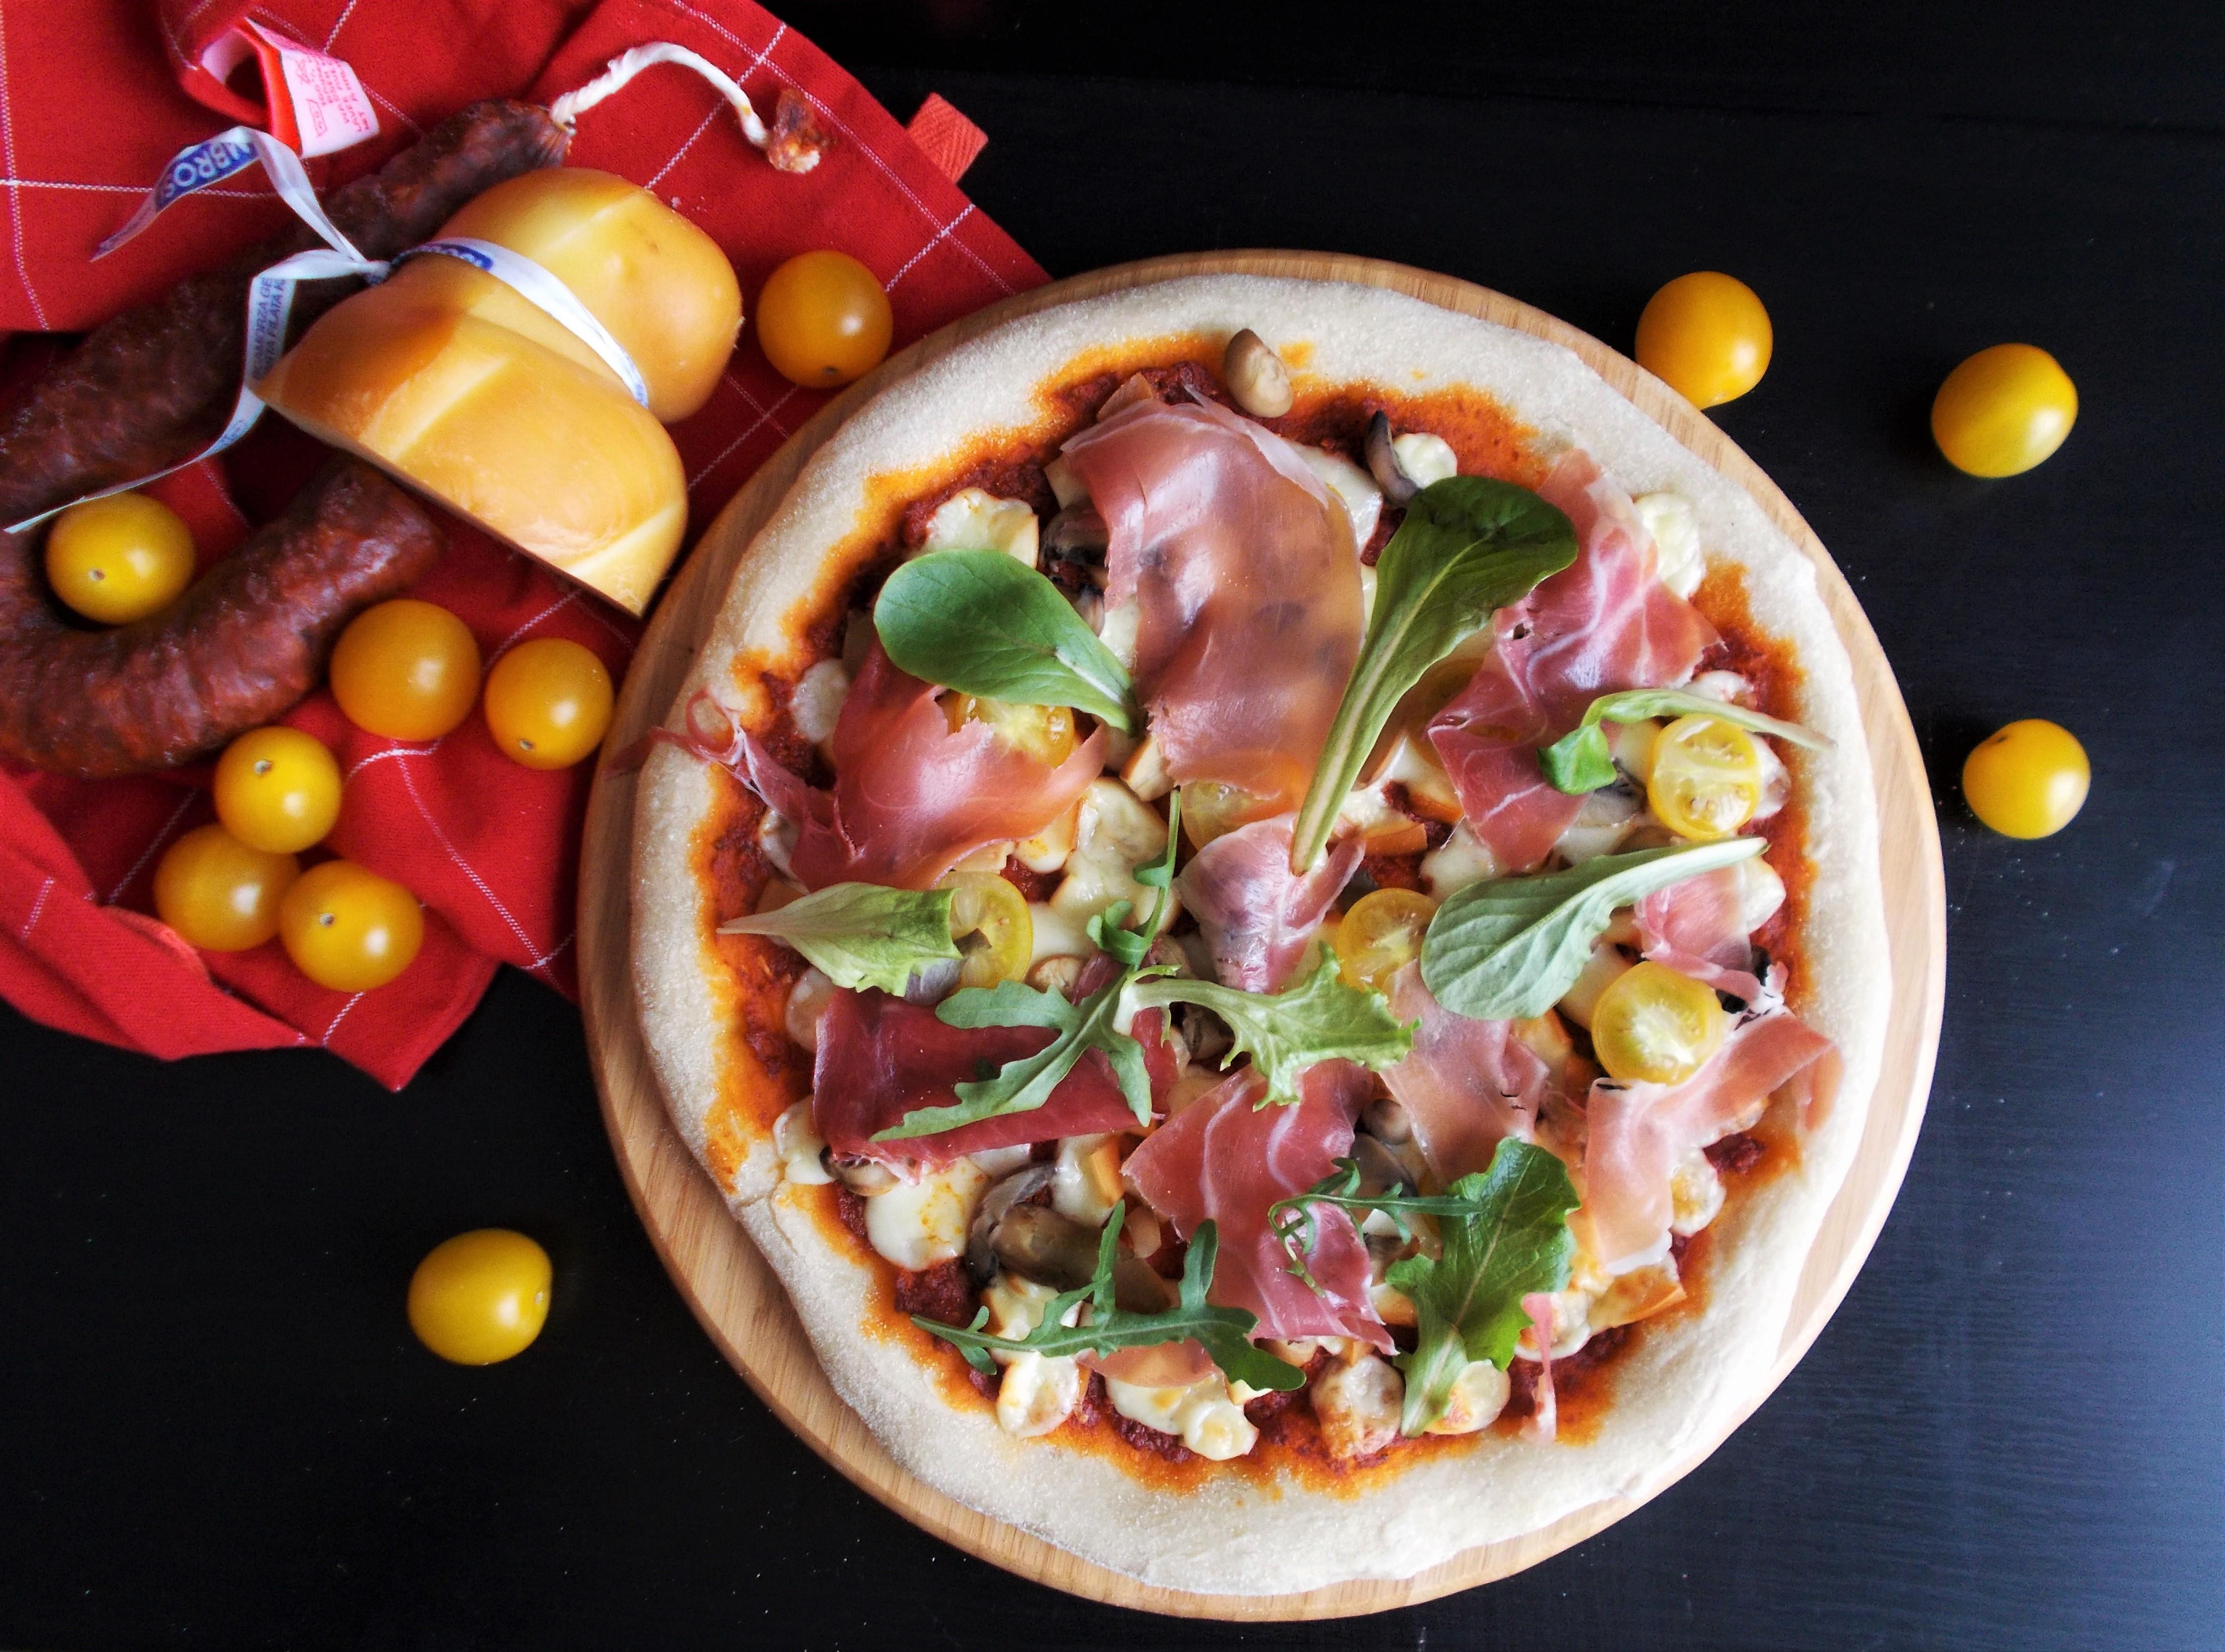 Pizza au chorizo, jambon cru et scamorza fumée